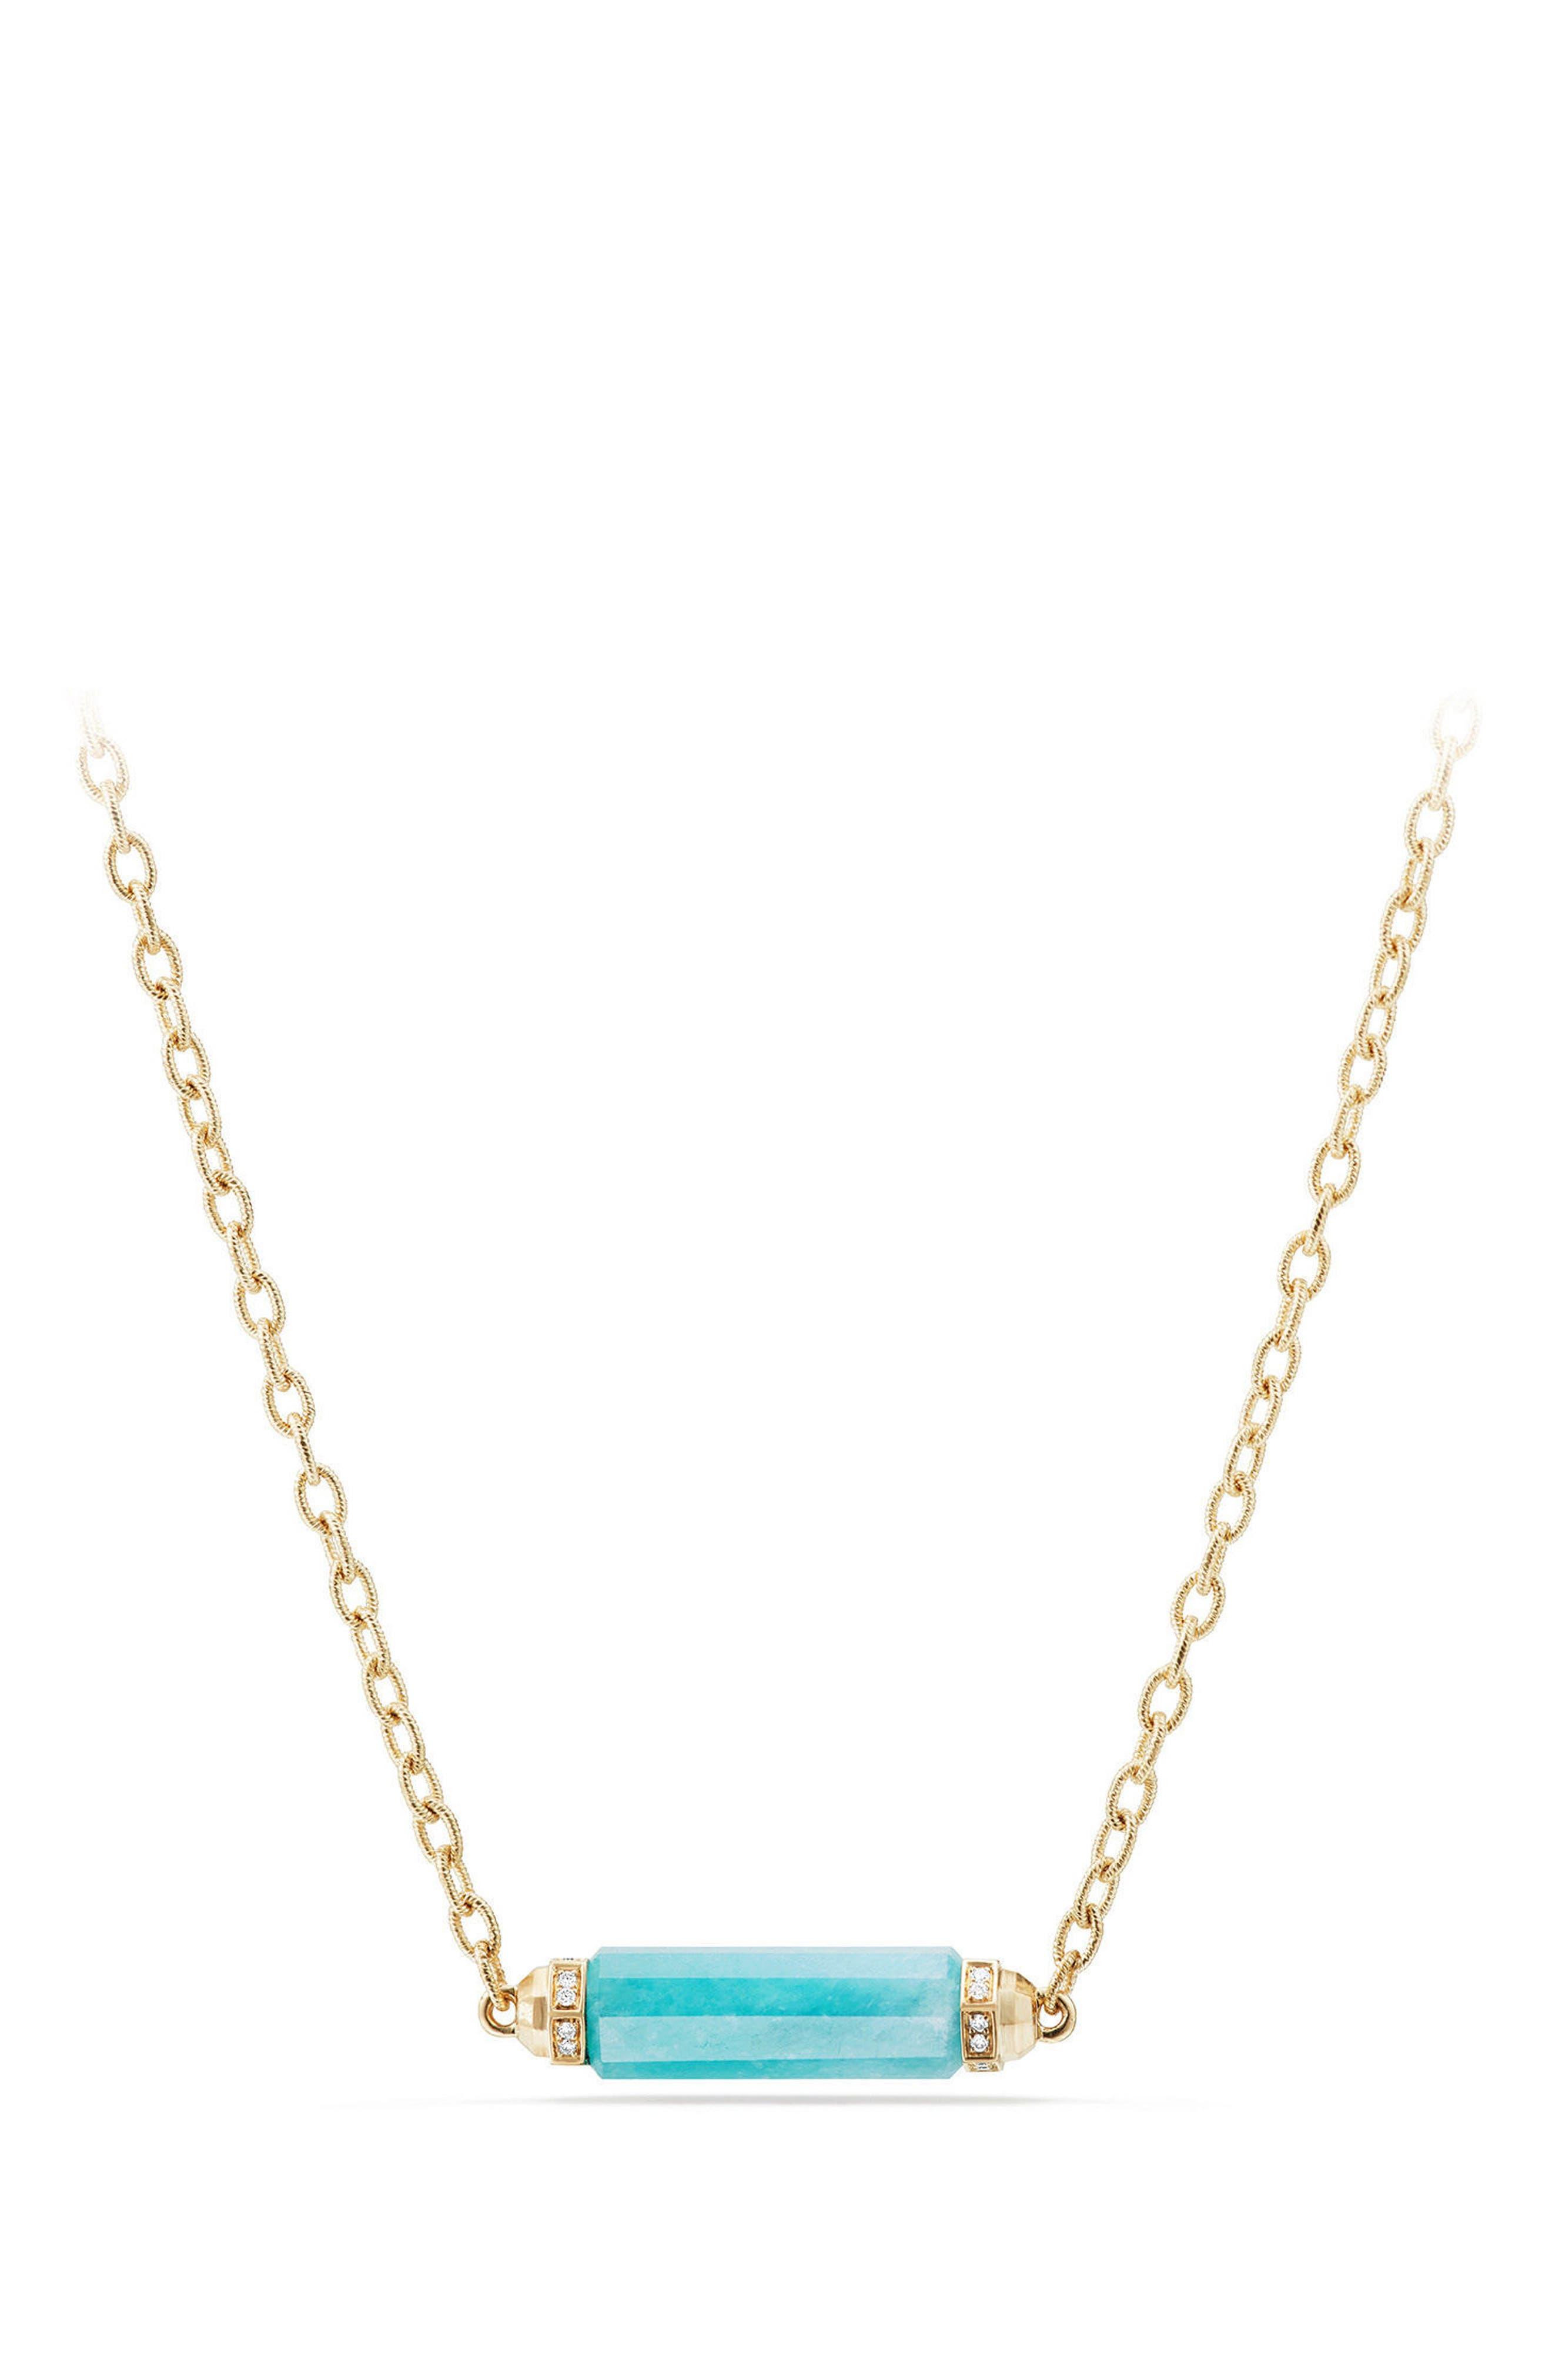 David Yurman Barrels Single Station Necklace with Diamonds in 18K Gold